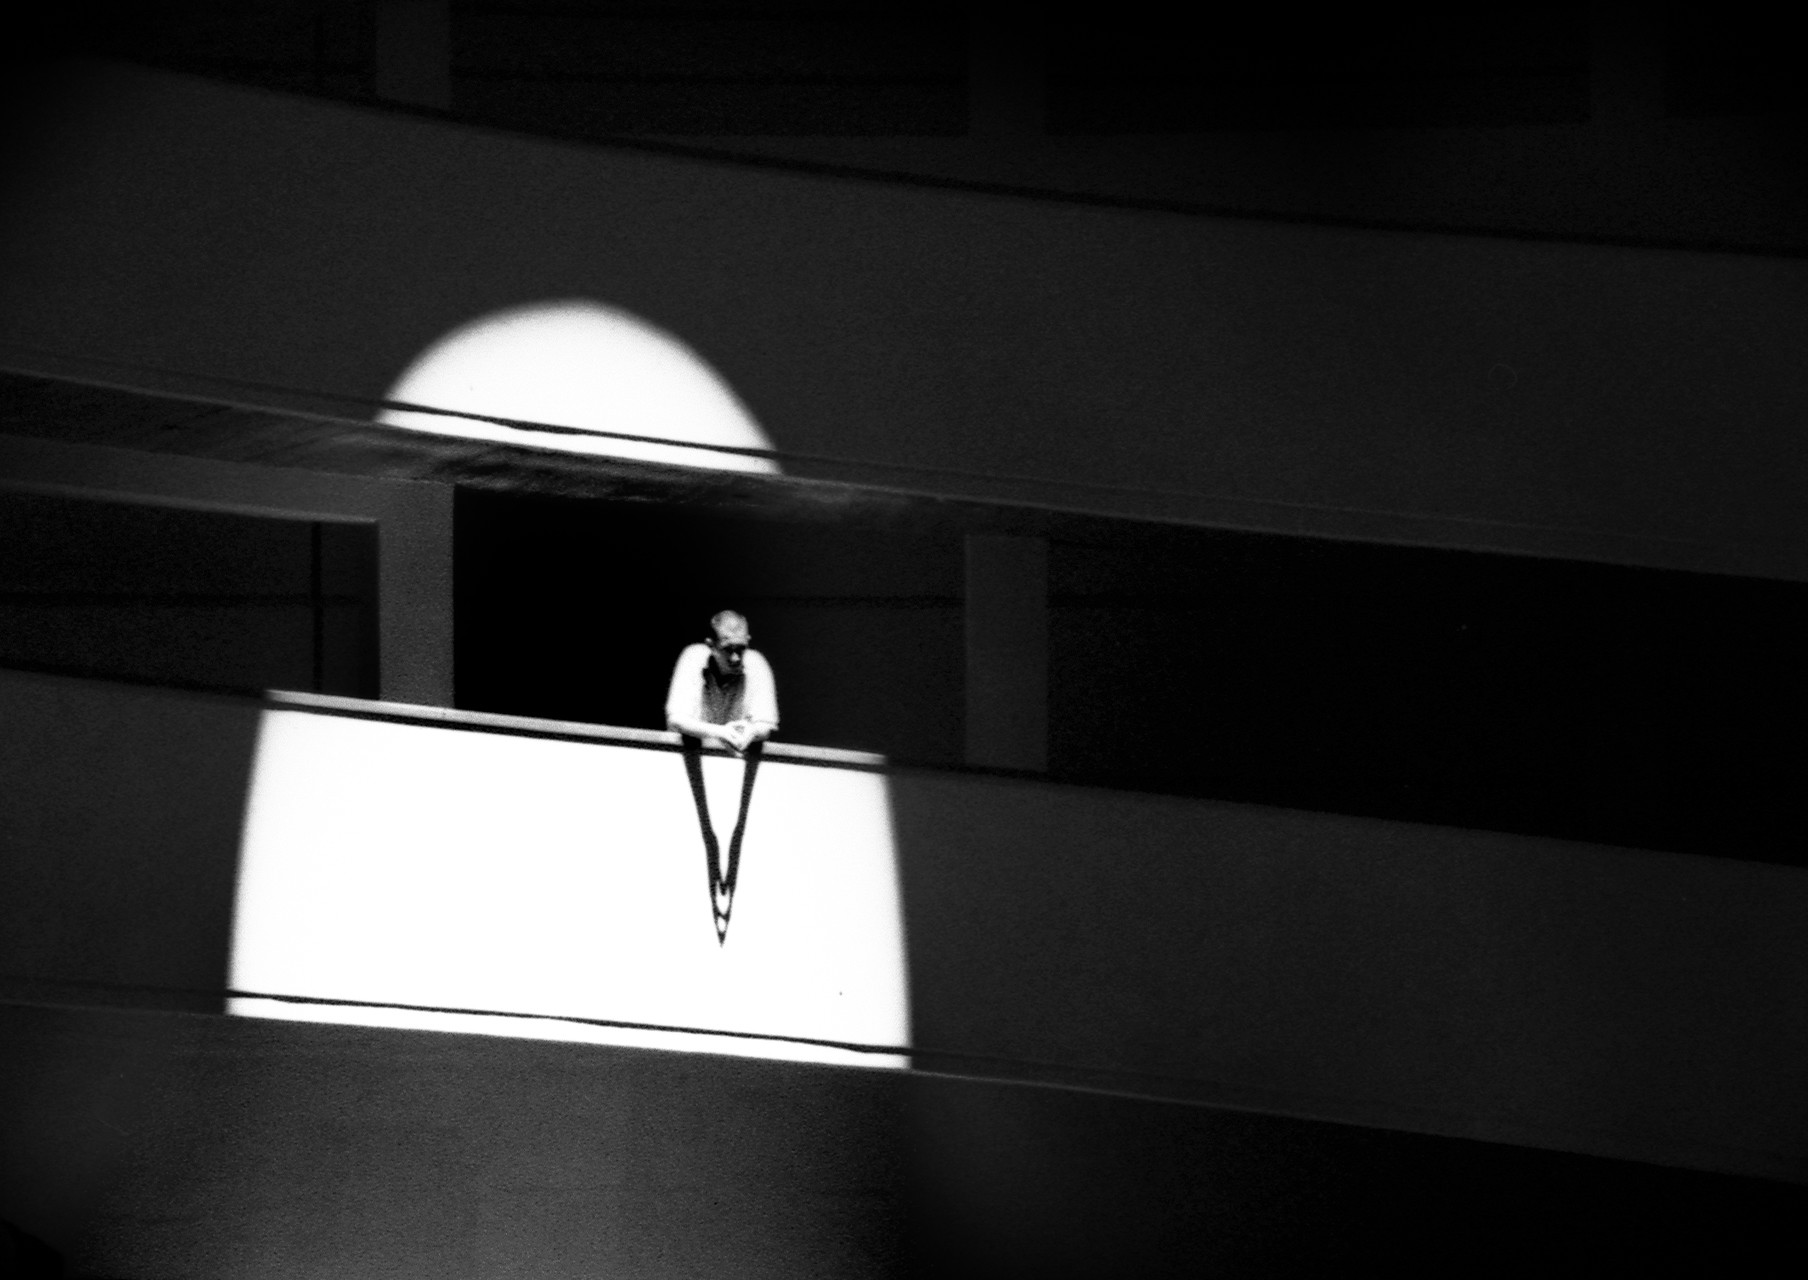 SKATE-STREET-PHOTOGRAPHY-14-JUANMI-MARQUEZ-1761x1280-1761x1280